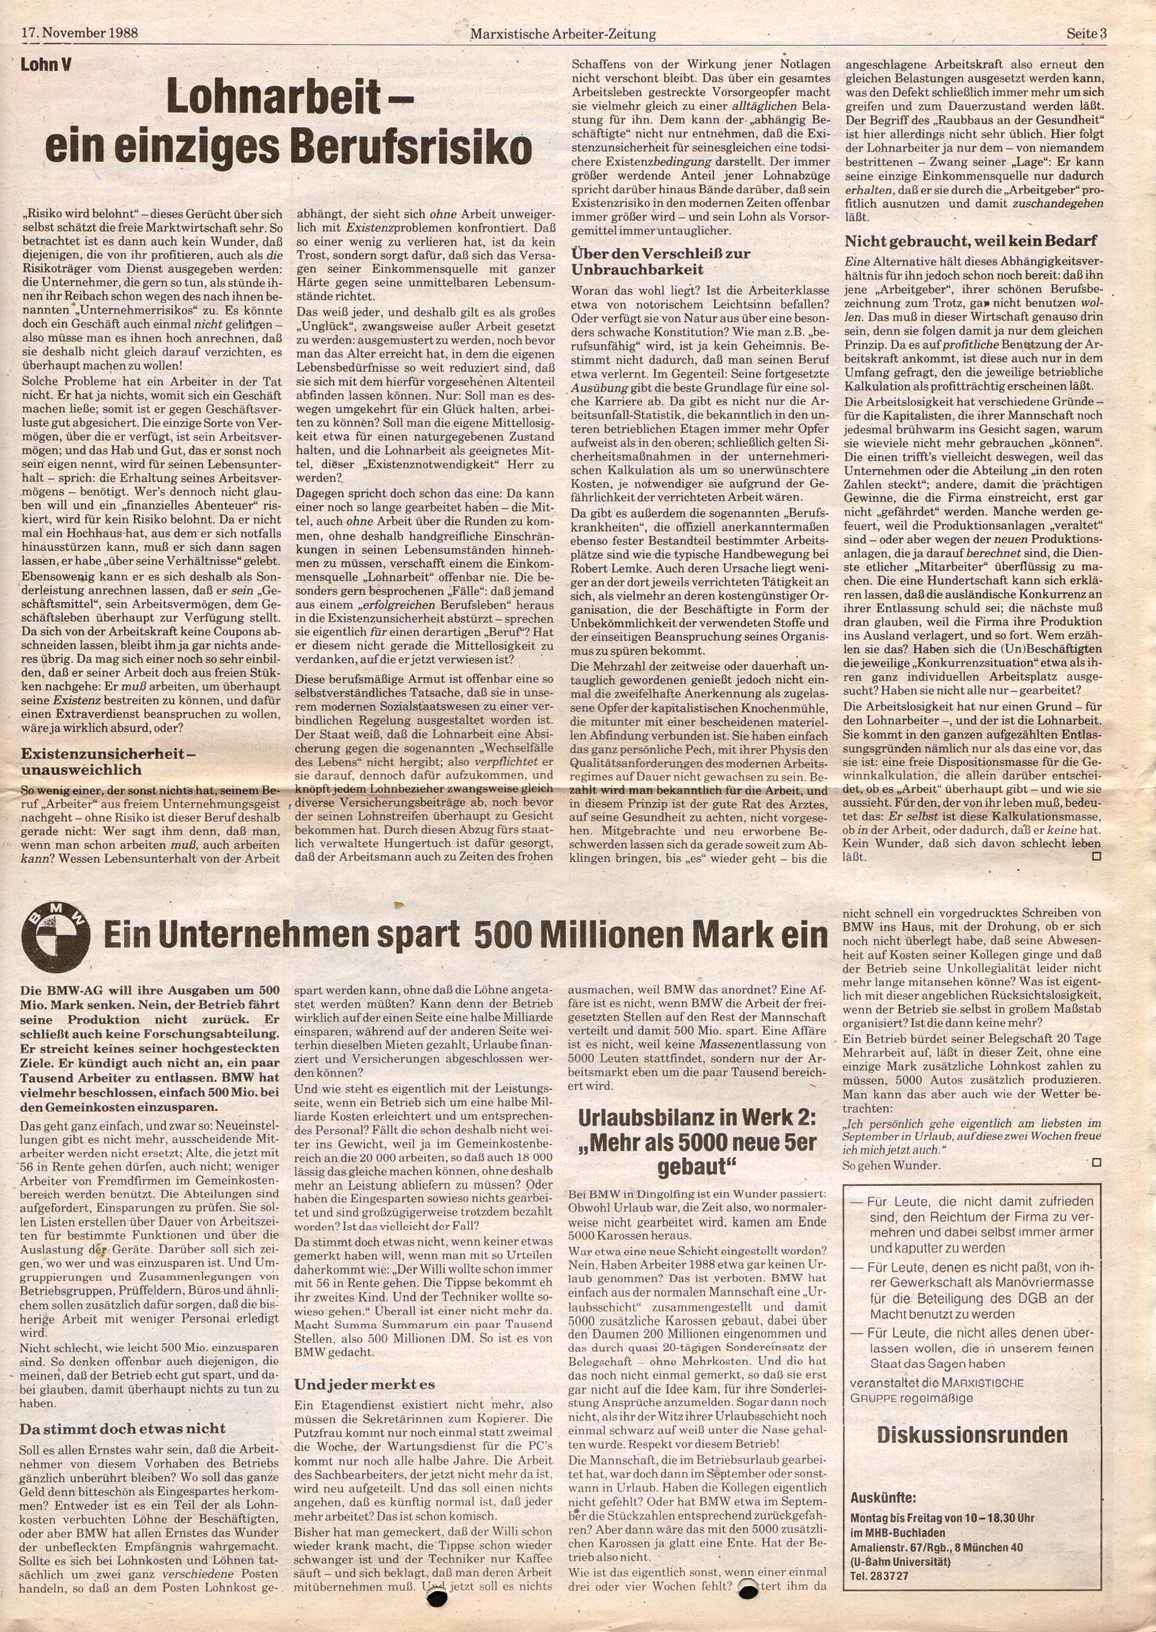 Muenchen_MG_MAZ_19881117_03